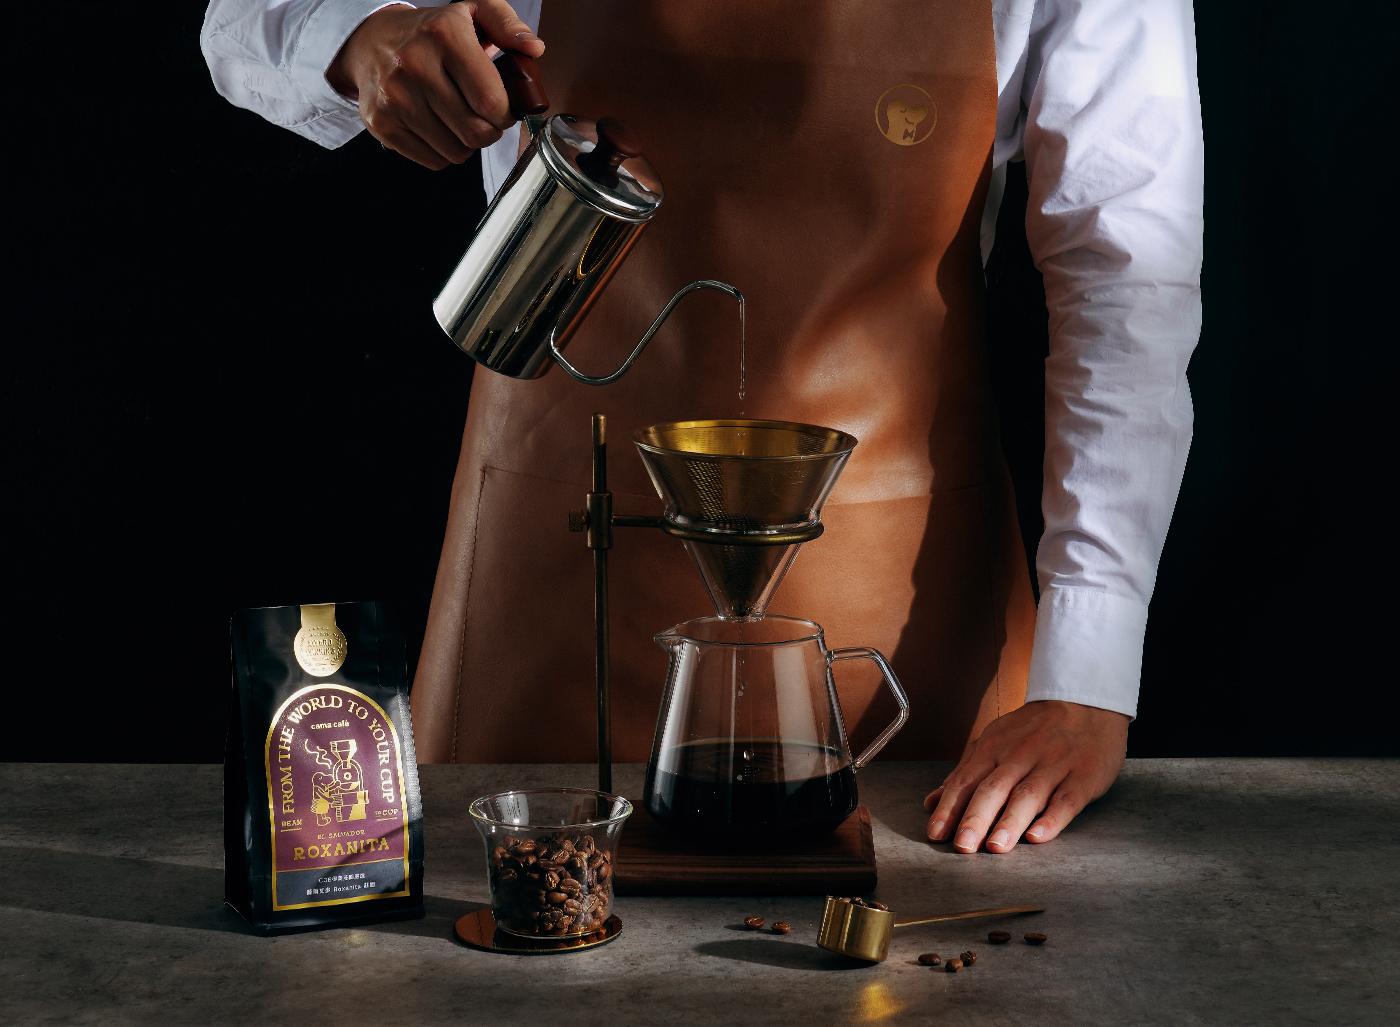 C.O.E Award-winning Specialty Coffee, Cama Café Designed by Lung-Hao Chiang